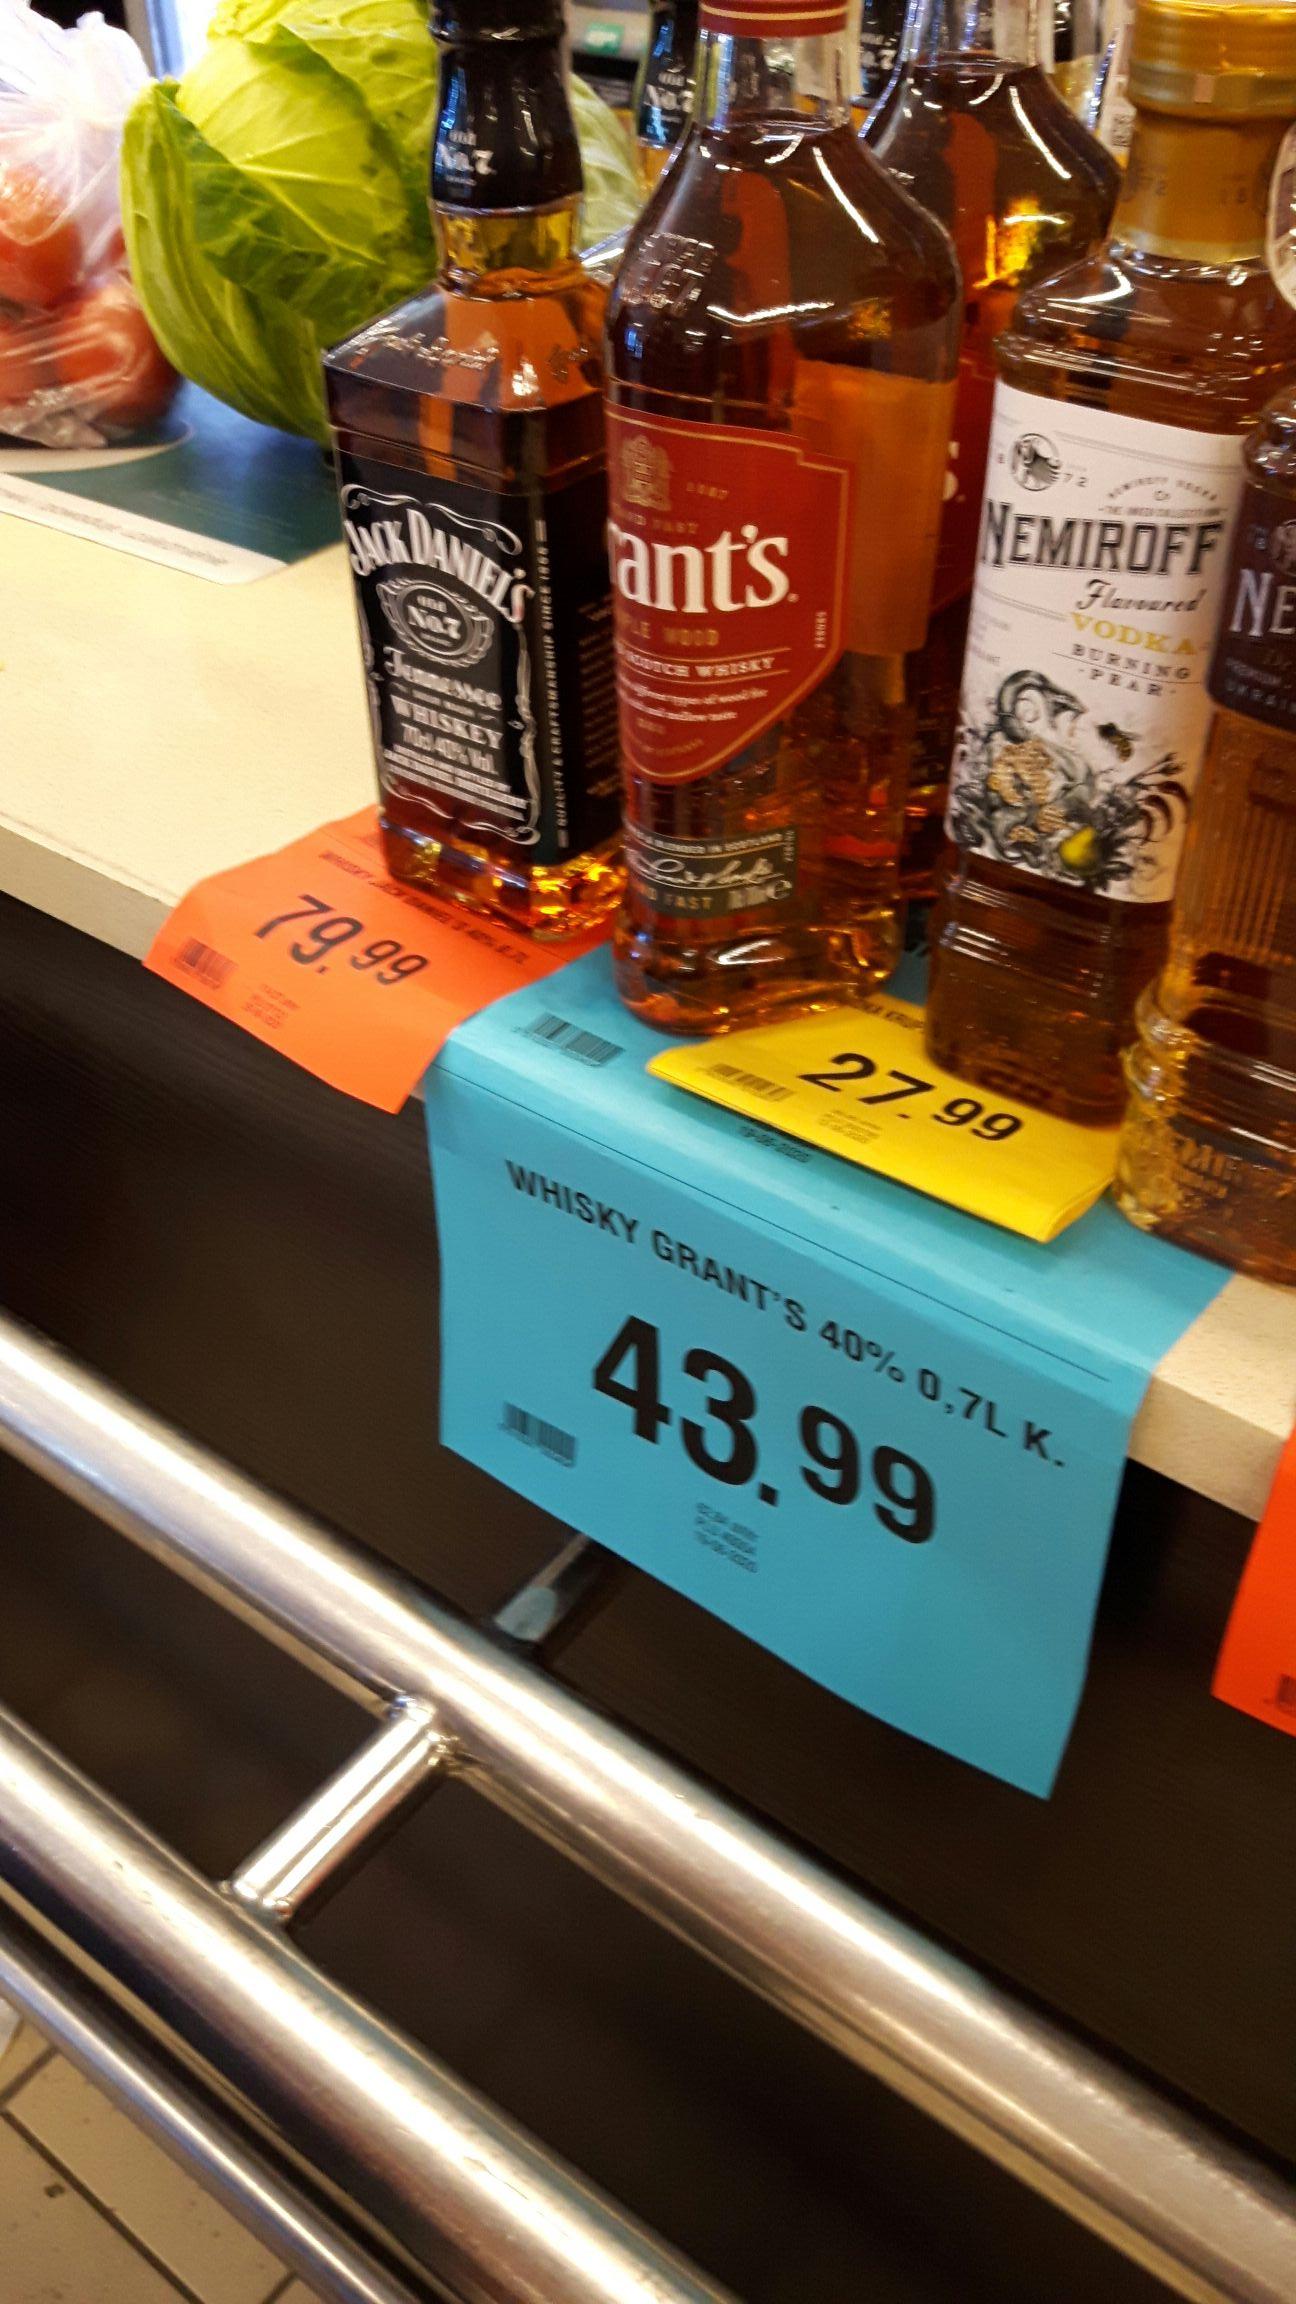 Whisky Grants 0.7l - Gdańsk, sklepy Merkus